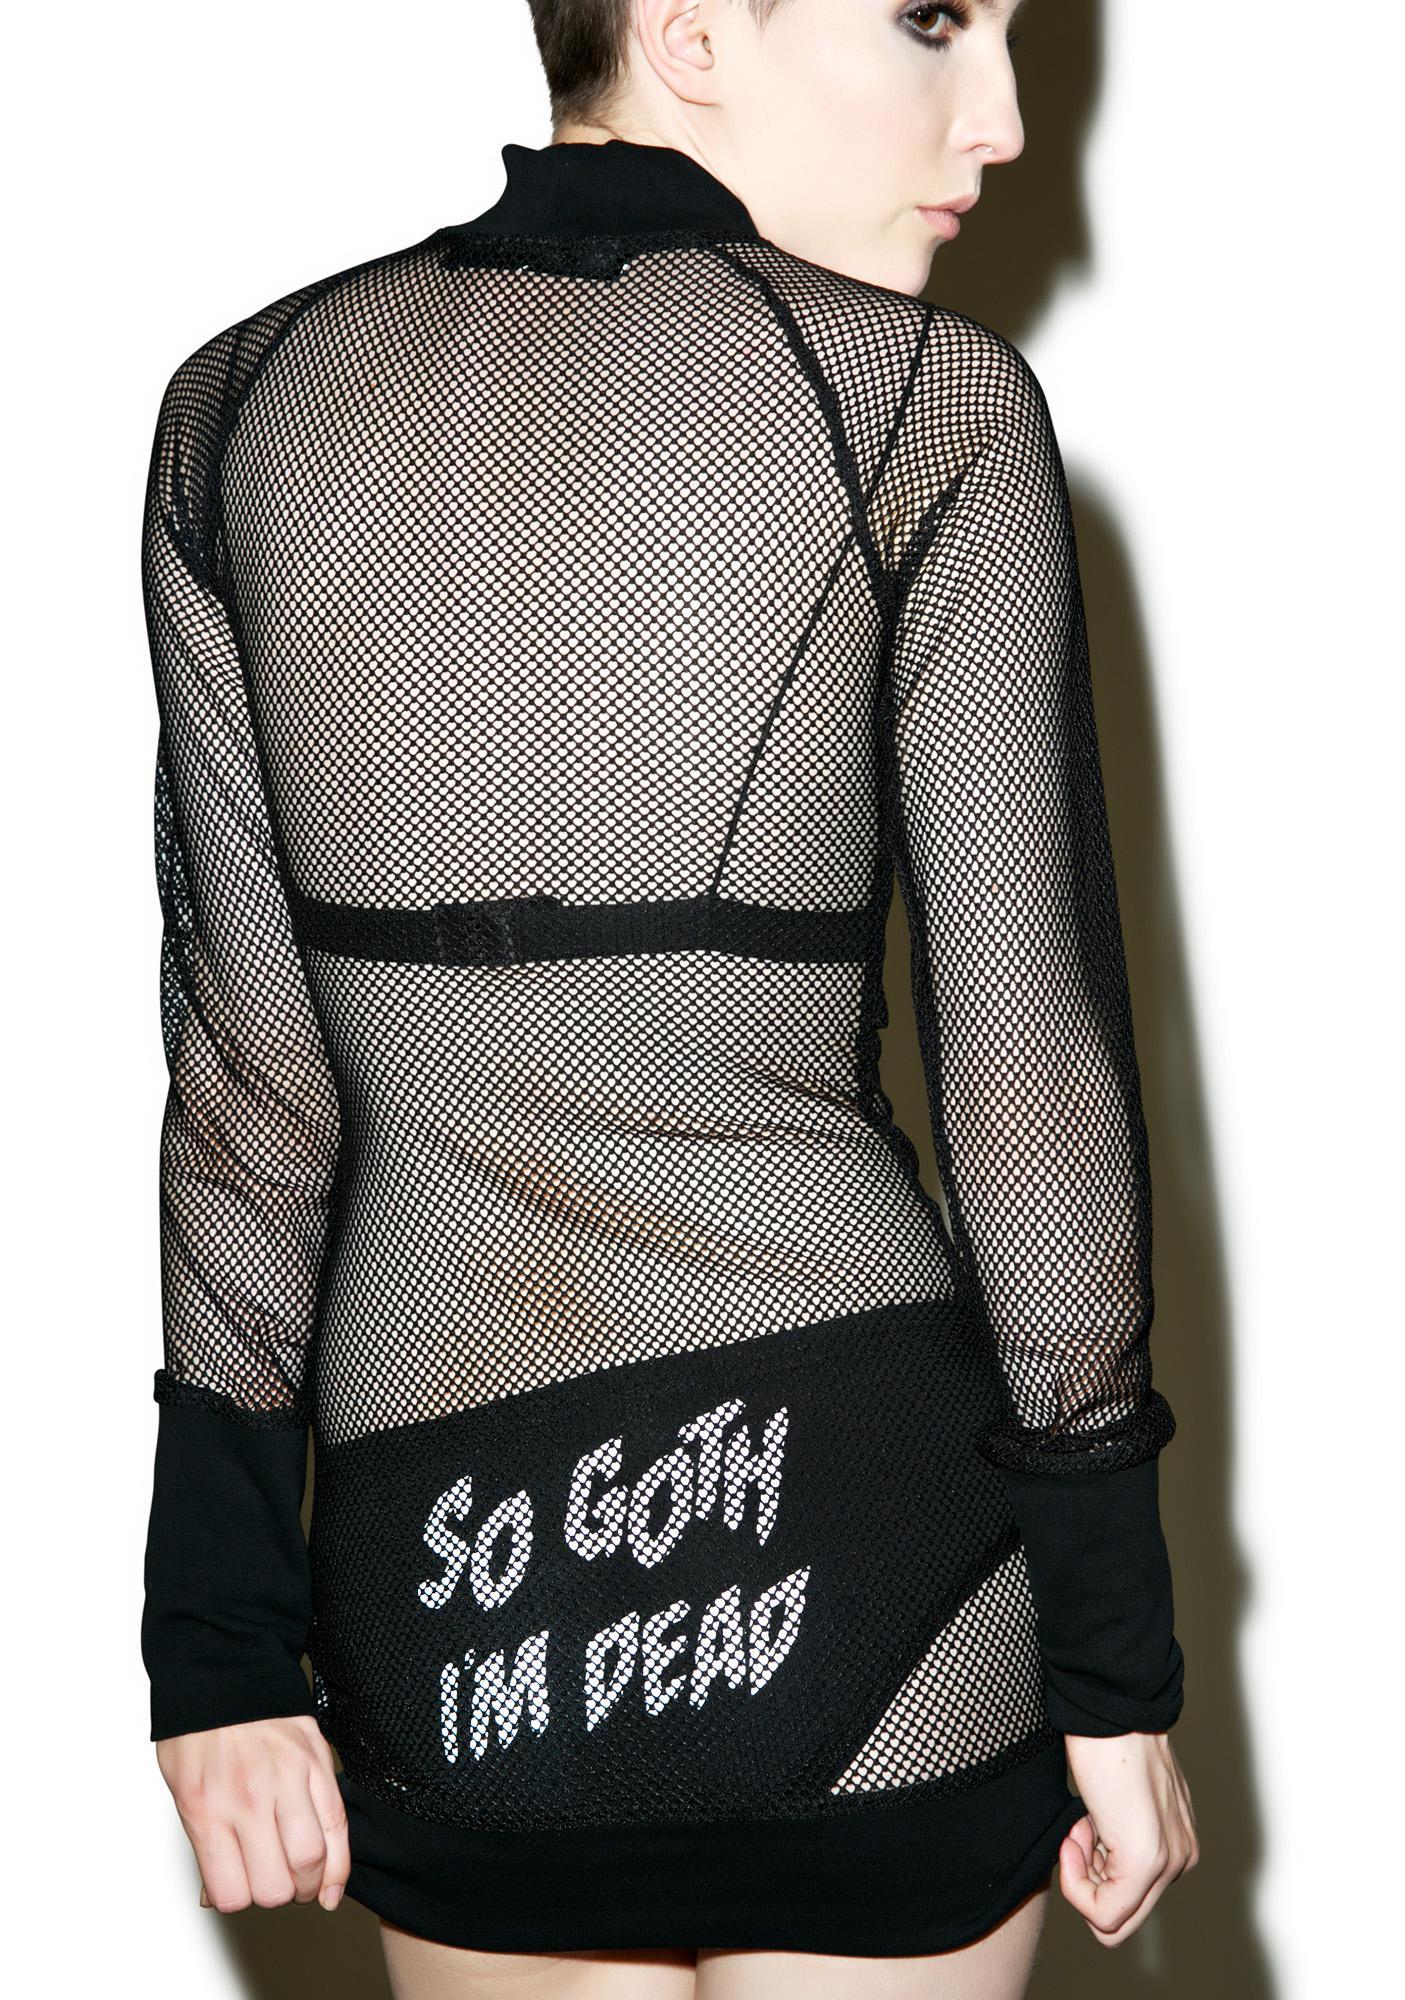 Goth Panties 10